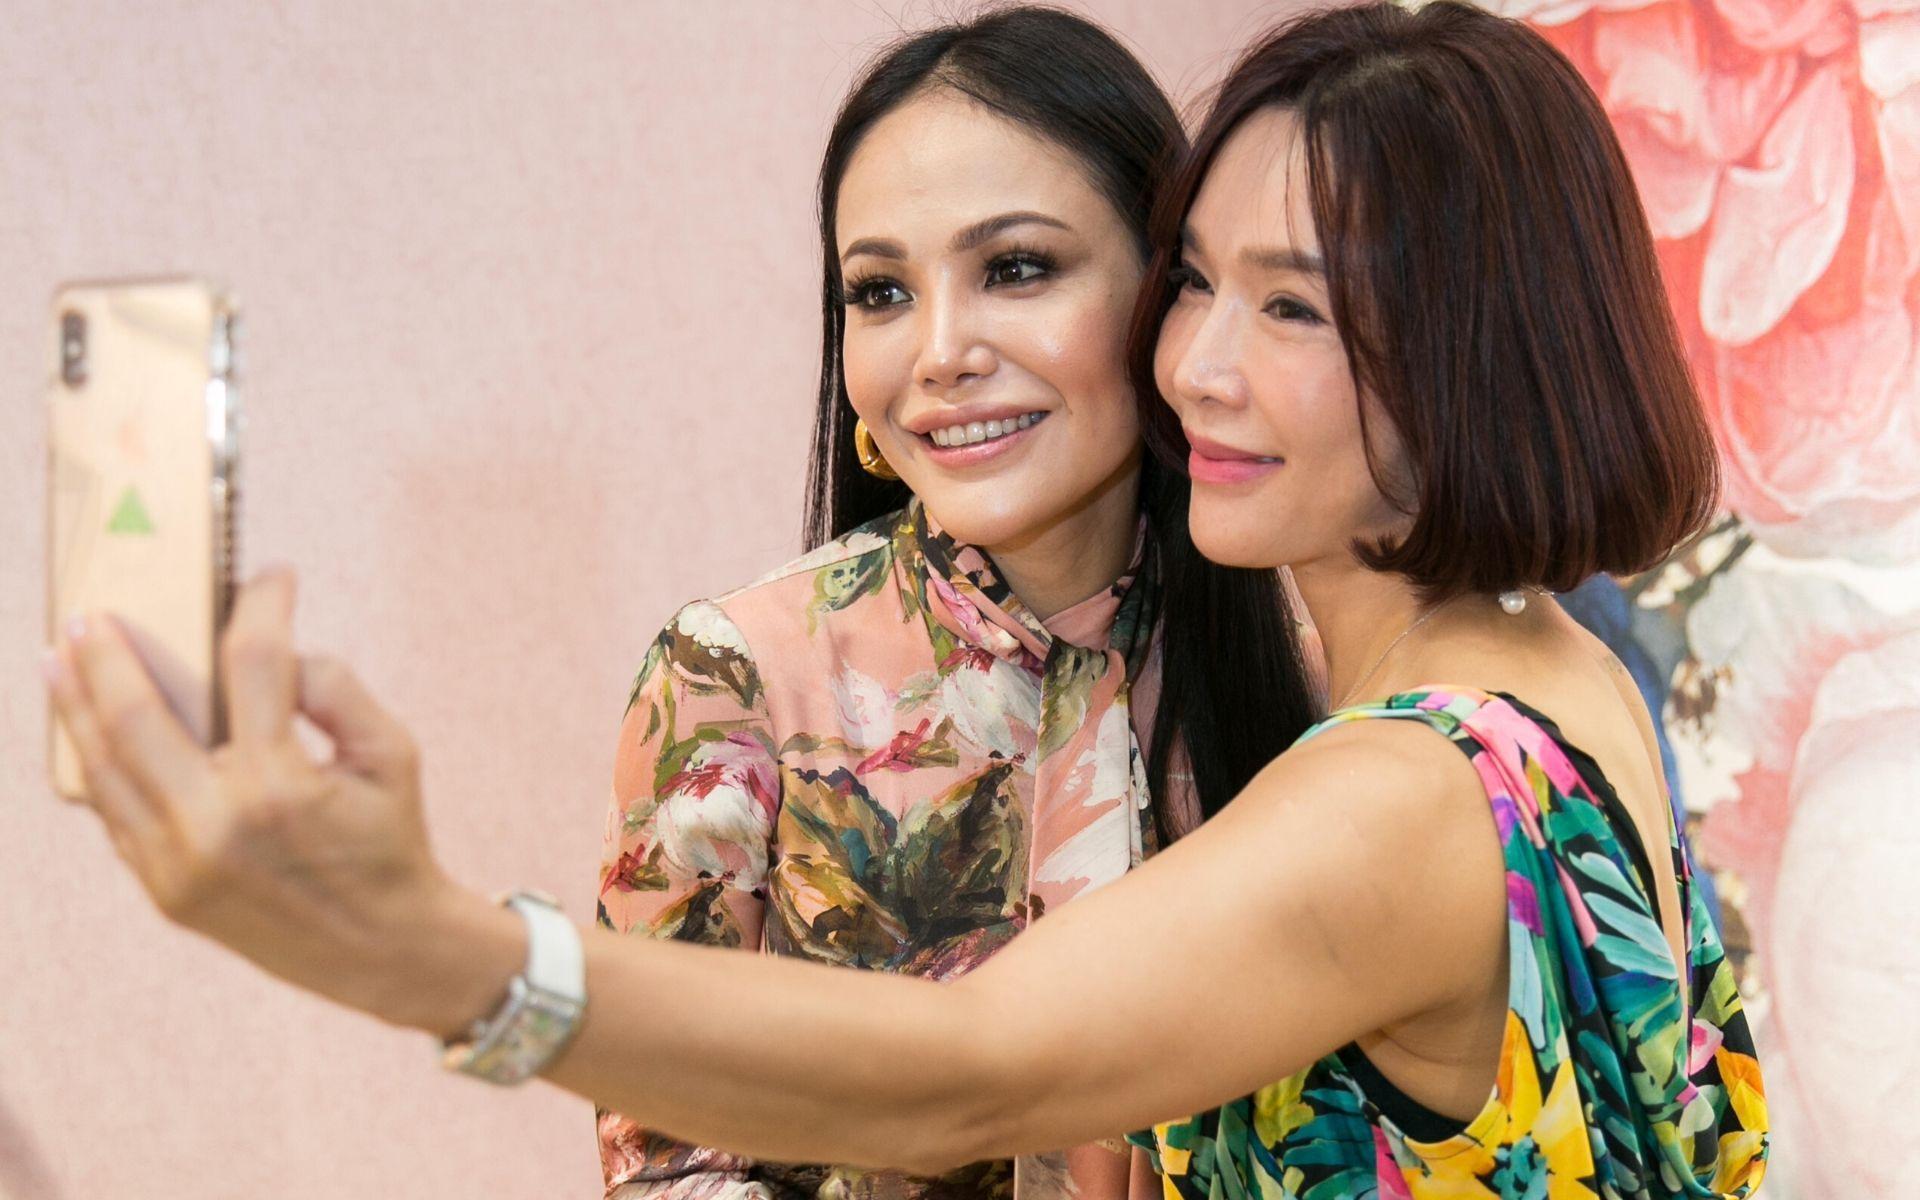 Sophia Mohd Noor and Cindy Chui